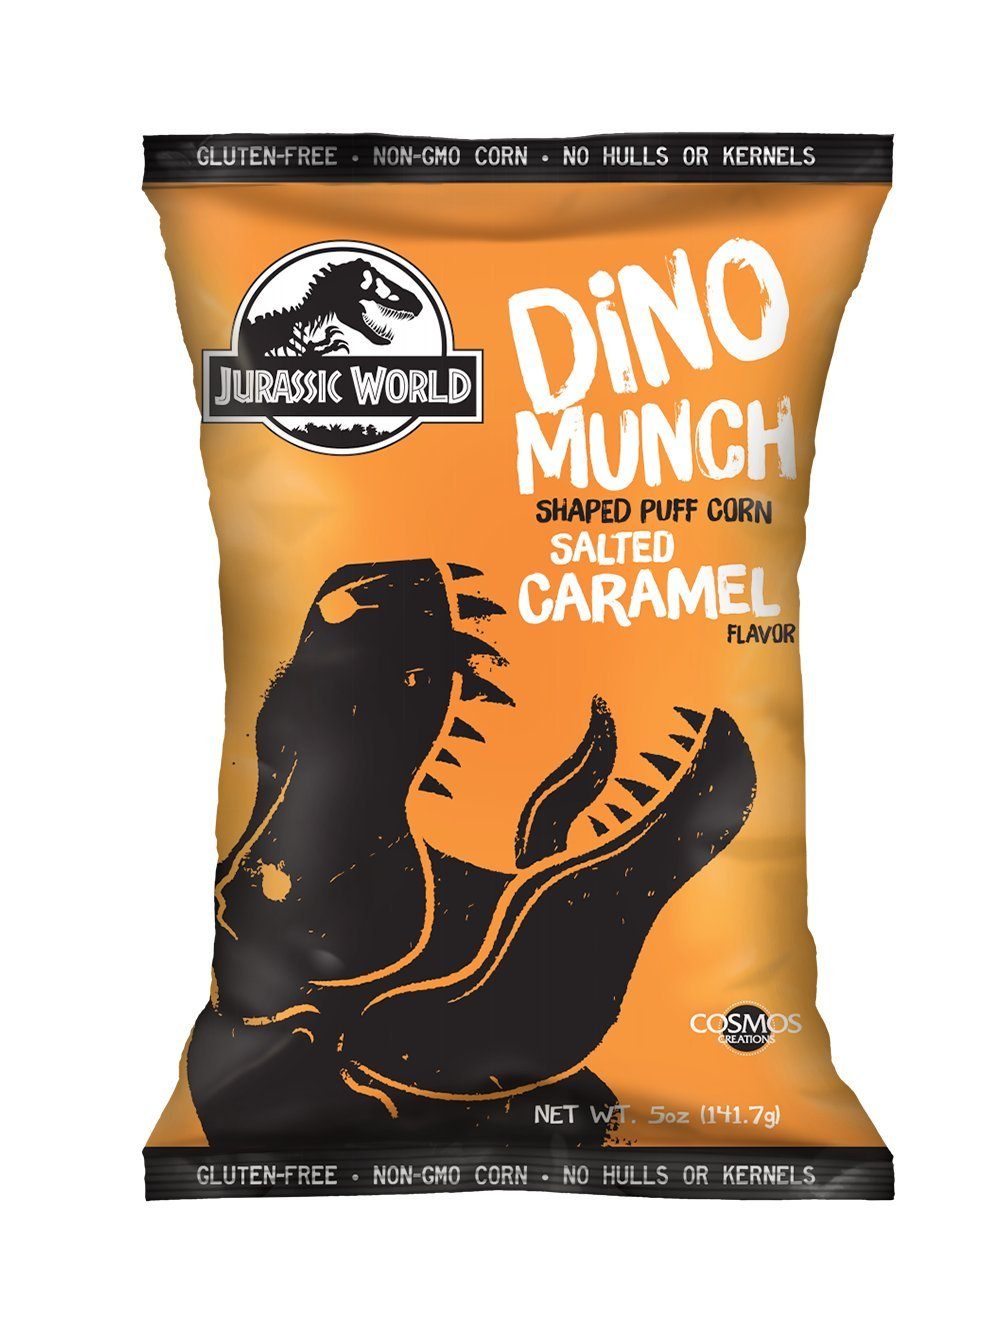 Jurassic World Dino Munch Salted Caramel Dino Shaped Puff Corn 5 oz, Case of 8 by Jurassic World